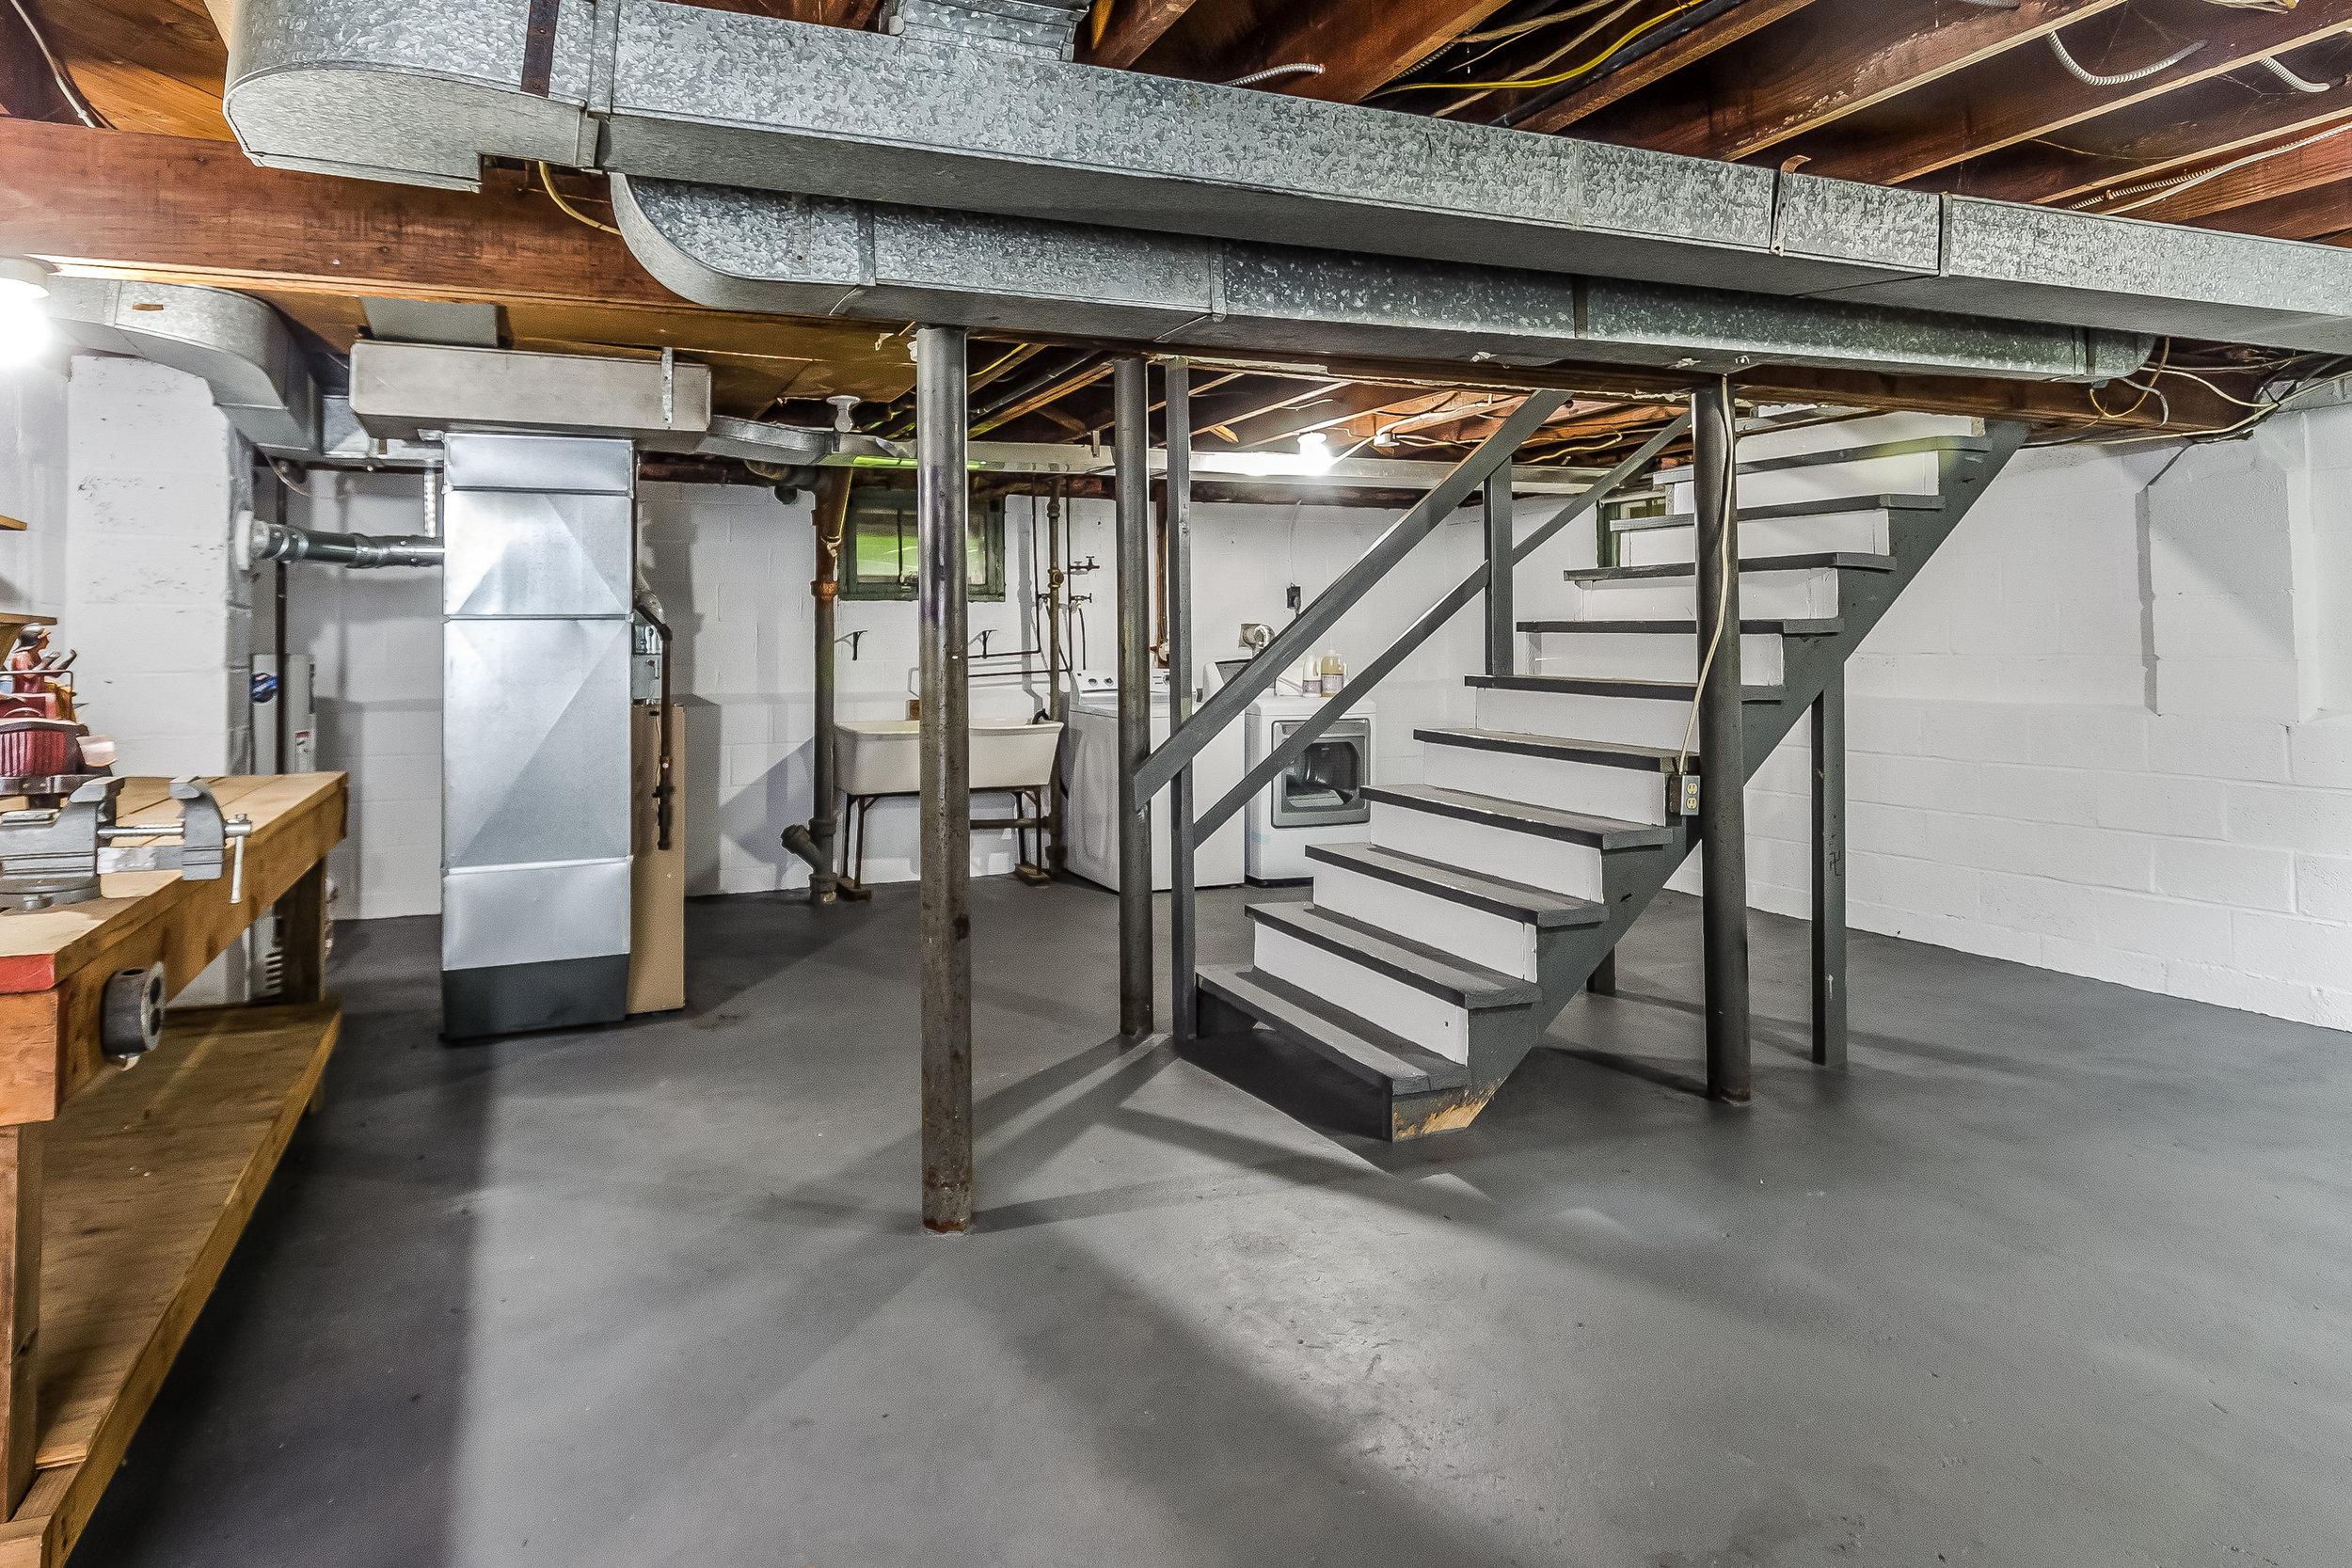 036-photo-unfinished-basement-5786571.jpg